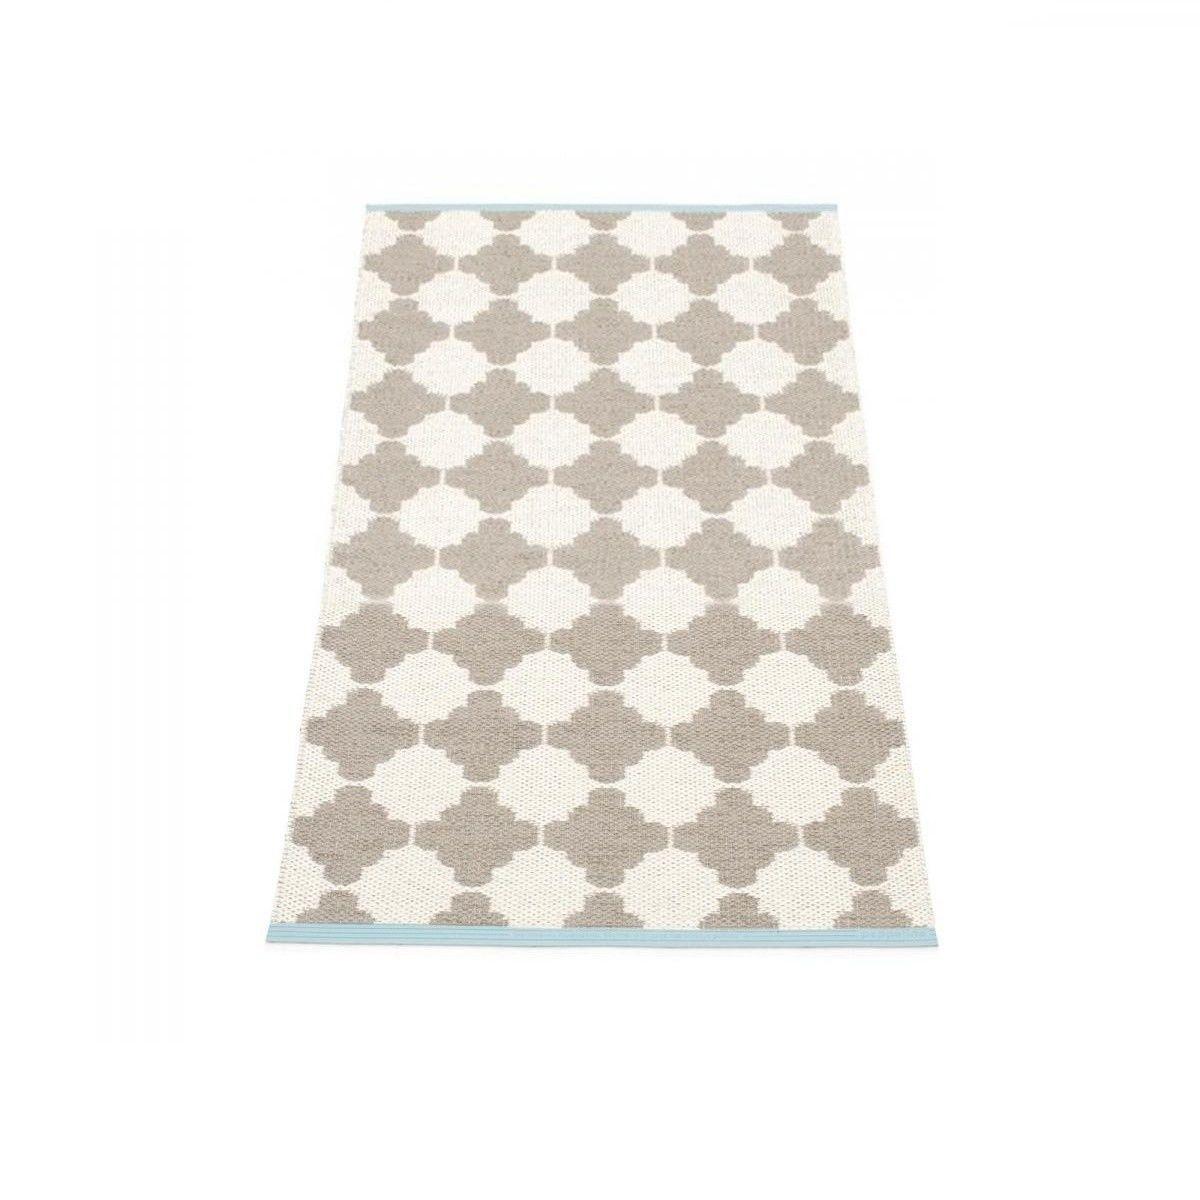 marre plastic rug 70x90cm pappelina outdoor rugs outdoor. Black Bedroom Furniture Sets. Home Design Ideas